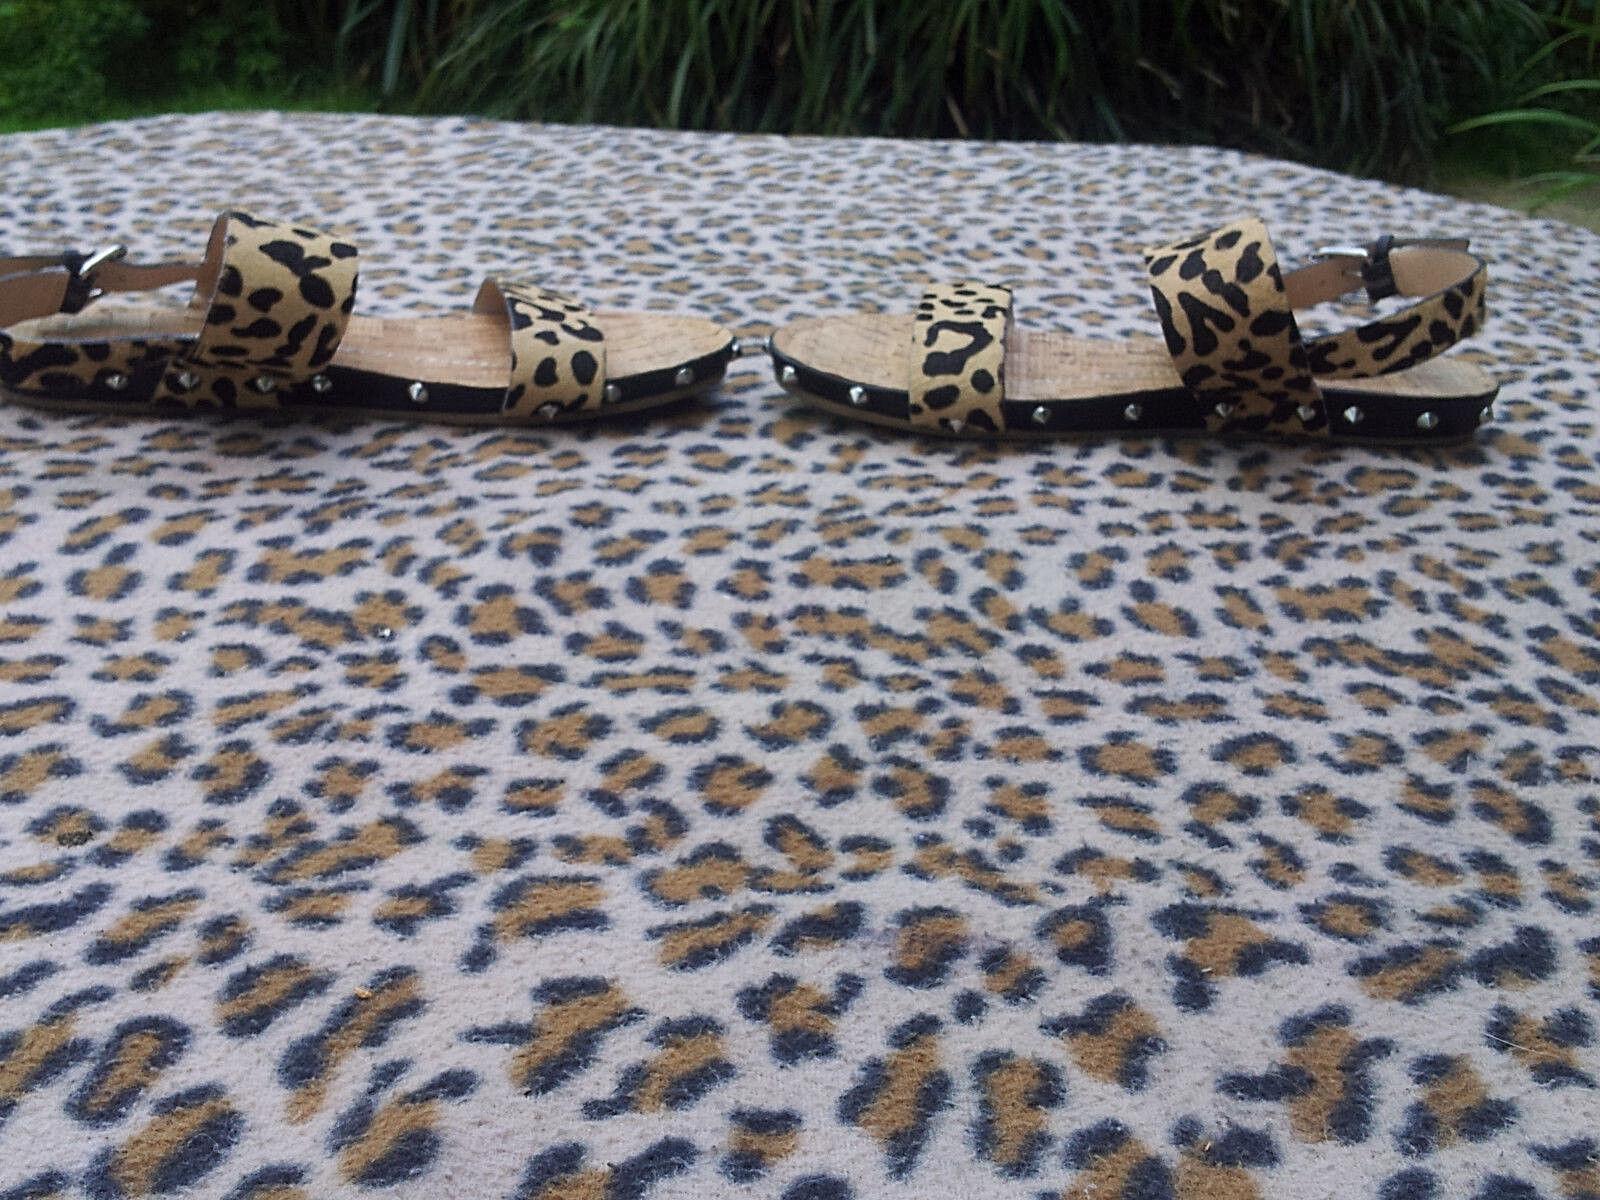 Dv Dolce  Vita real fur Animal  Dolce  leopard print Sandales  UK 4.5 EU 37.5 ba78a4